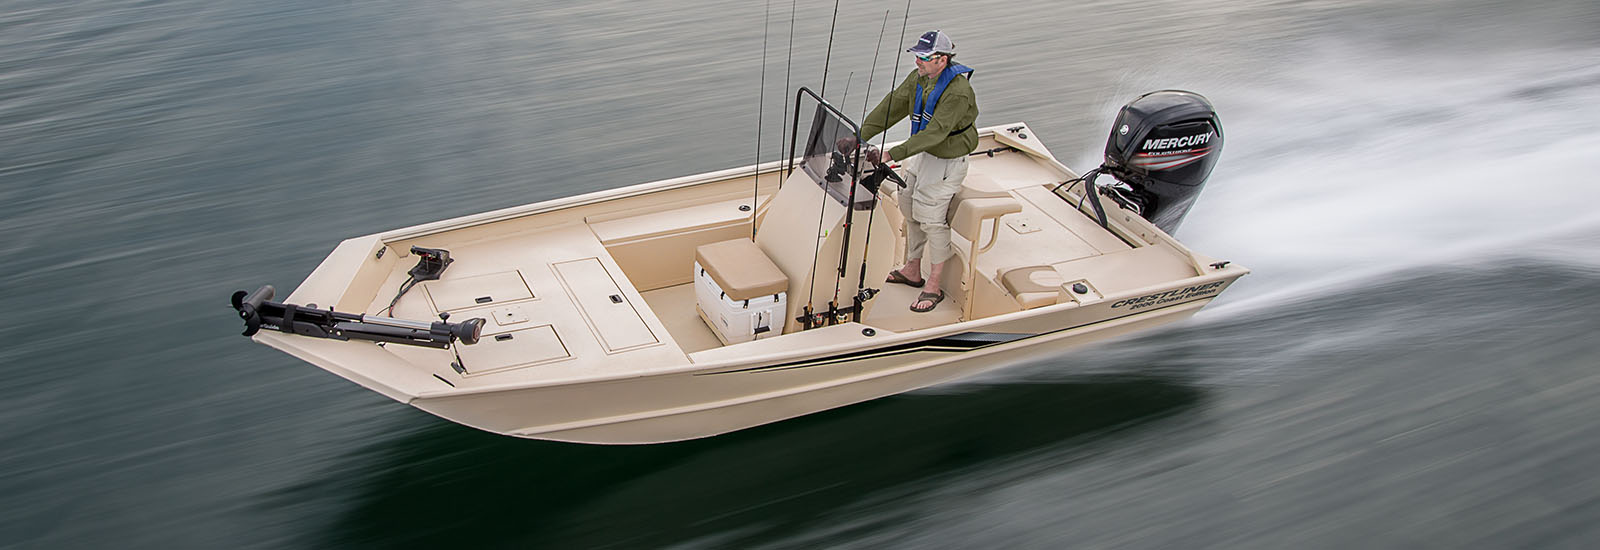 Center Console Aluminum Fishing Boats